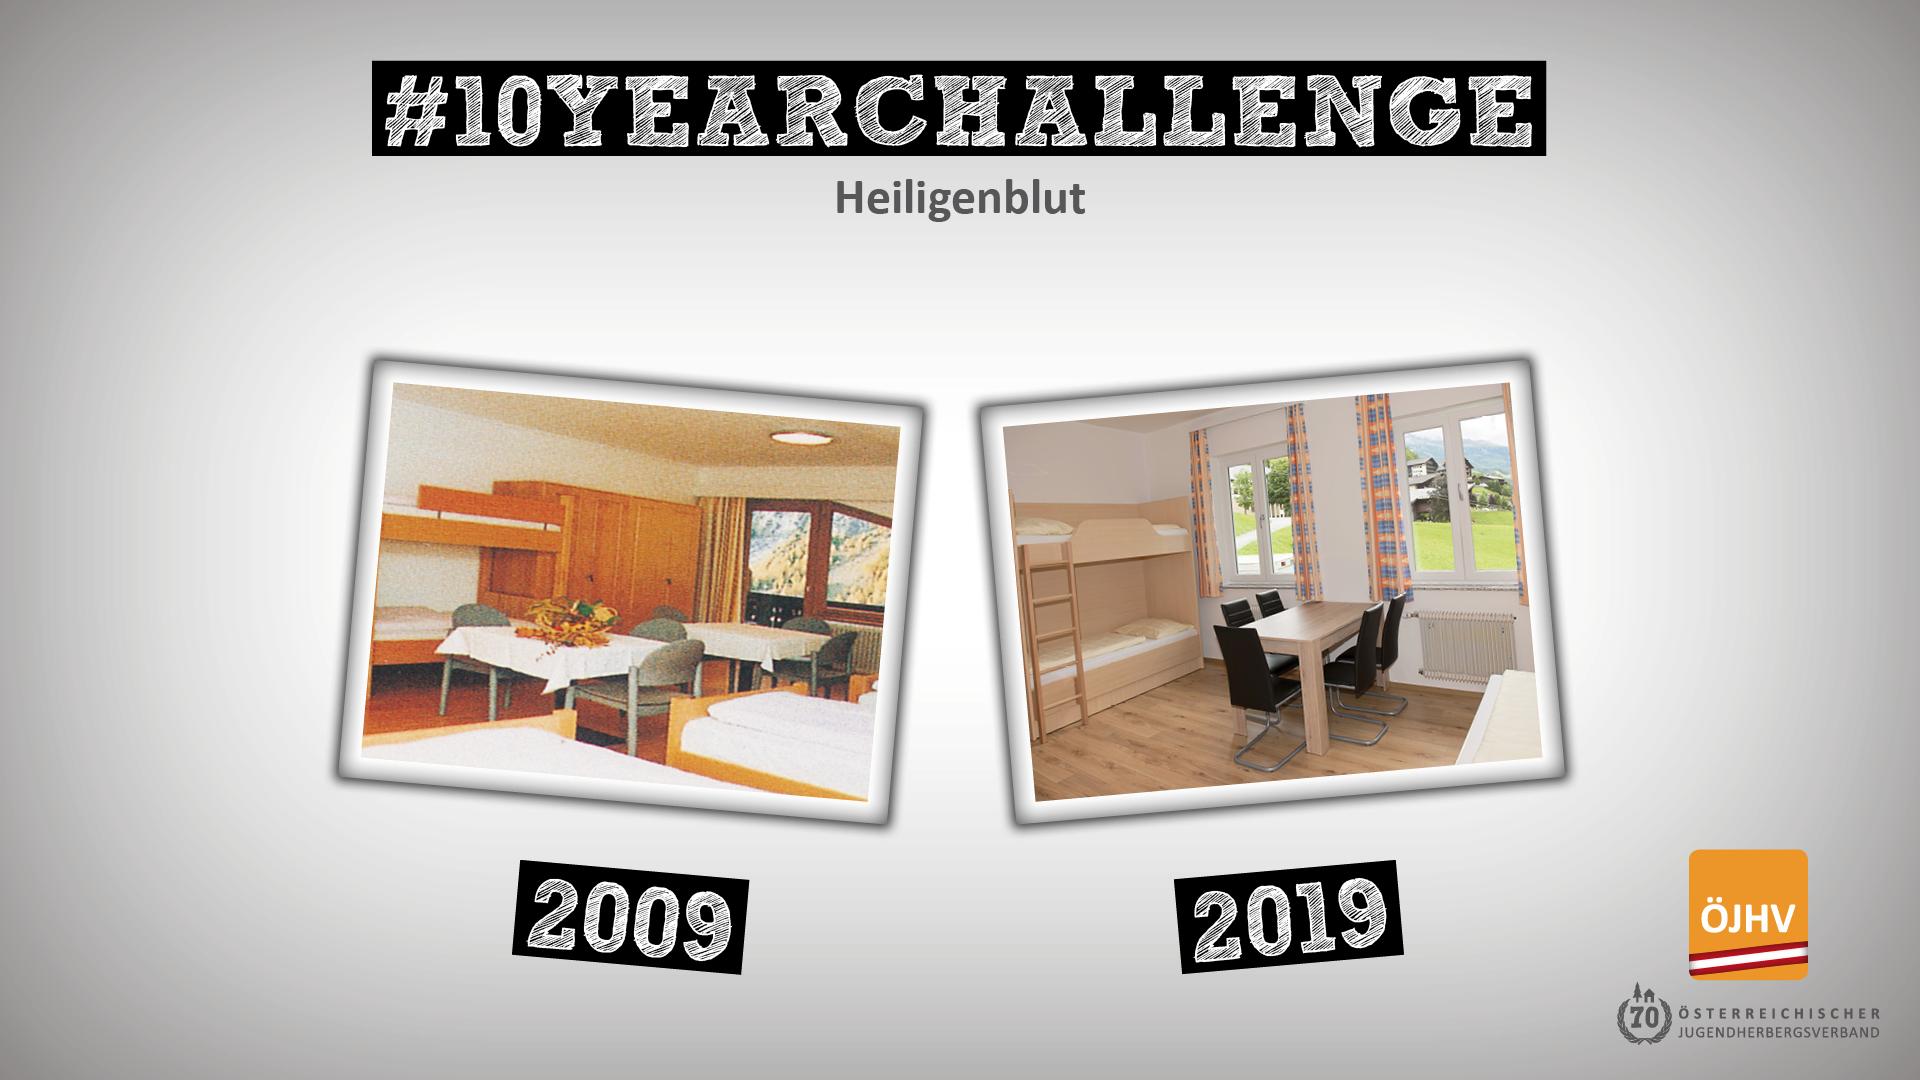 Jugendherbergsverband #10YearChallenge Heiligenblut